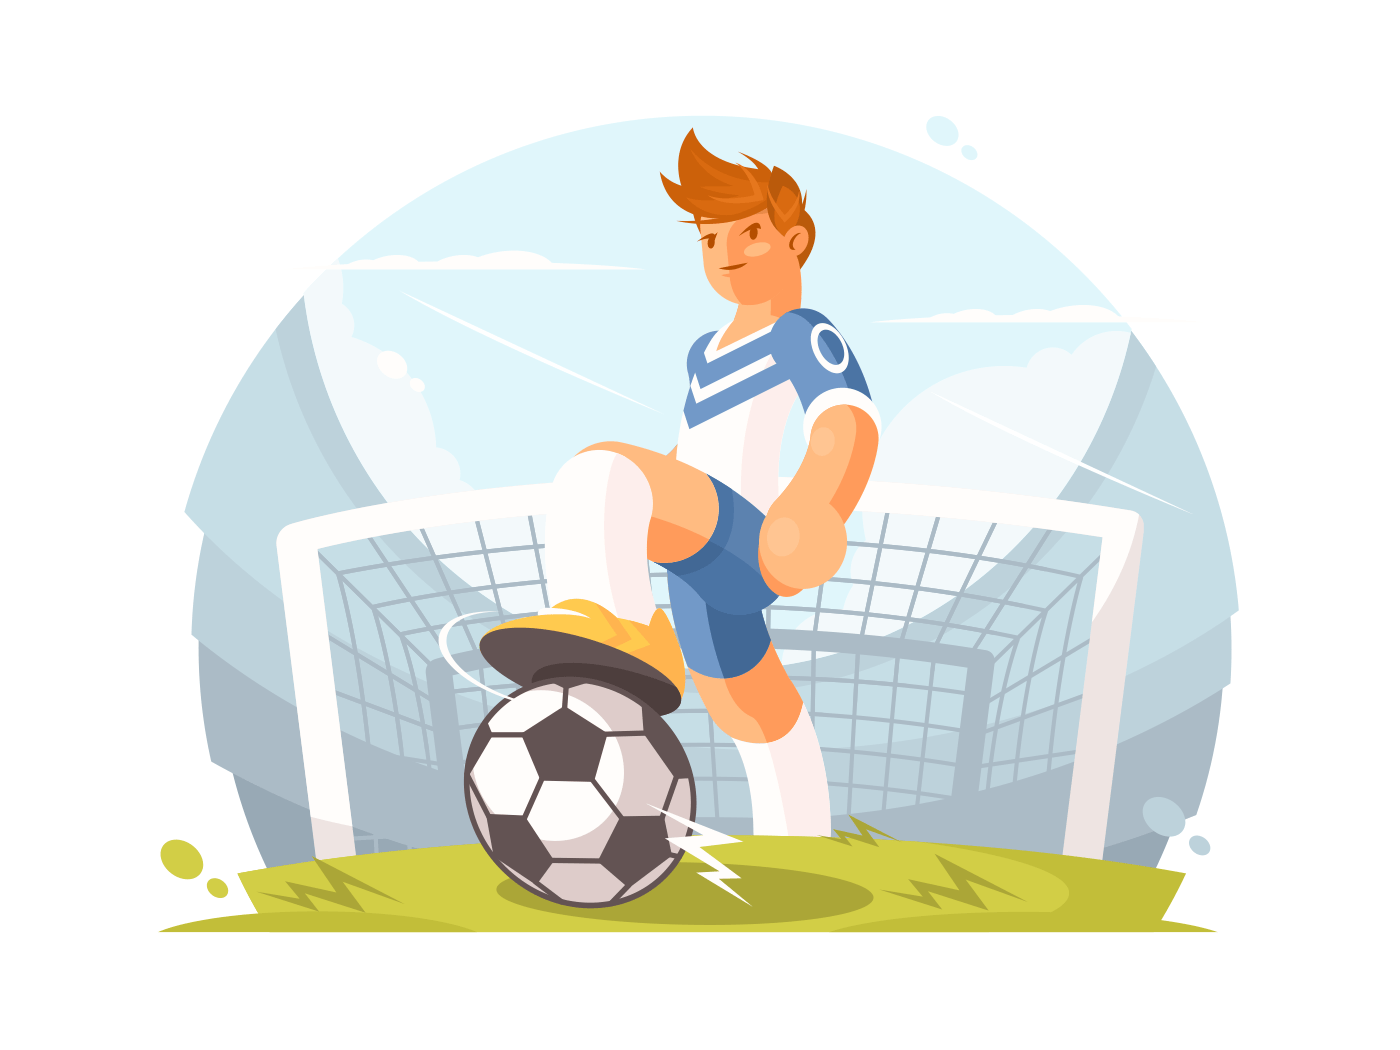 Cartoon character football player illustration